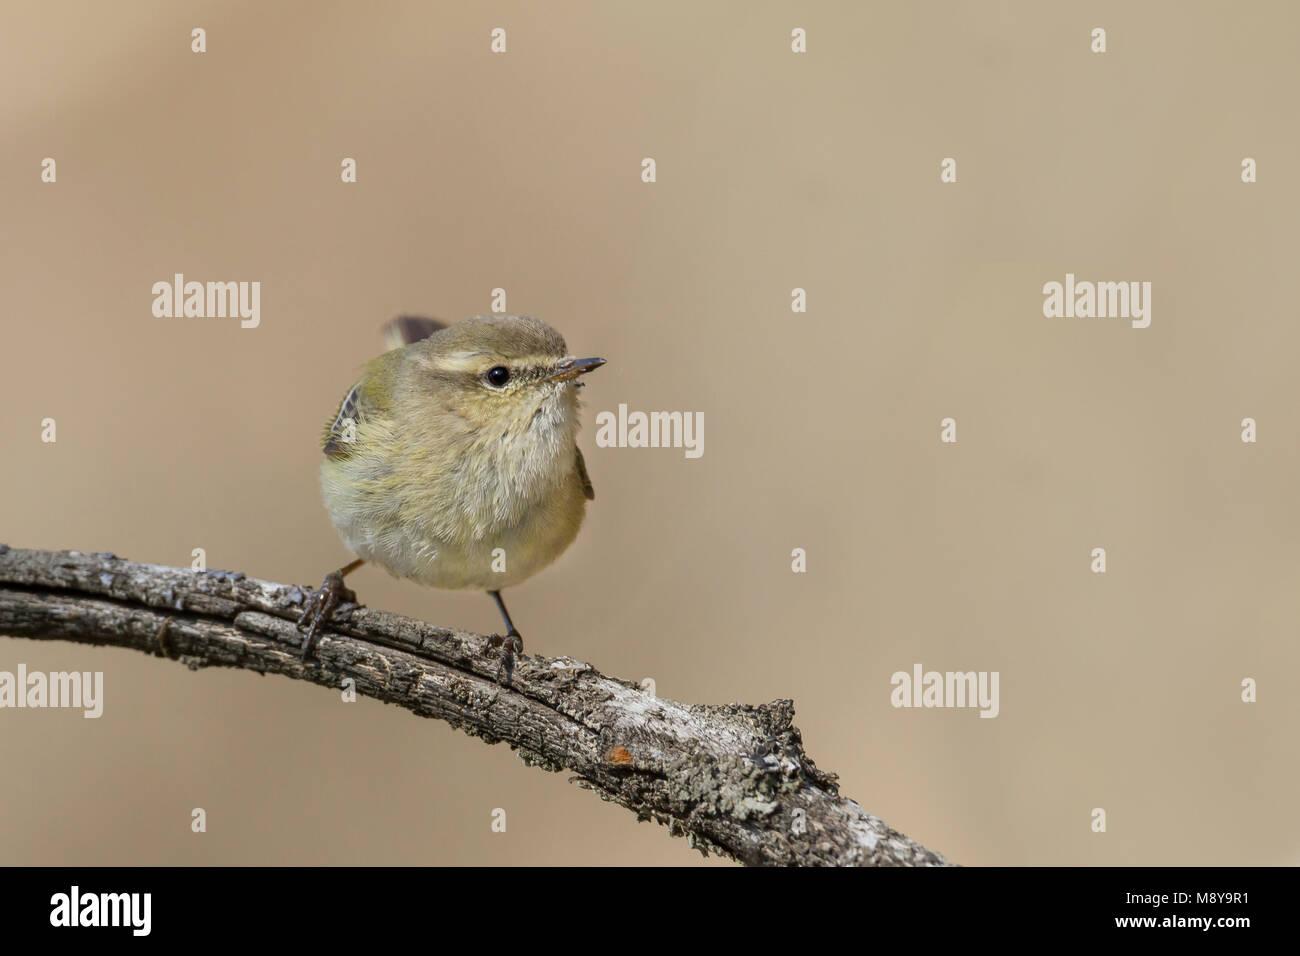 Humes Bladkoning; Hume's Leaf Warbler Stock Photo